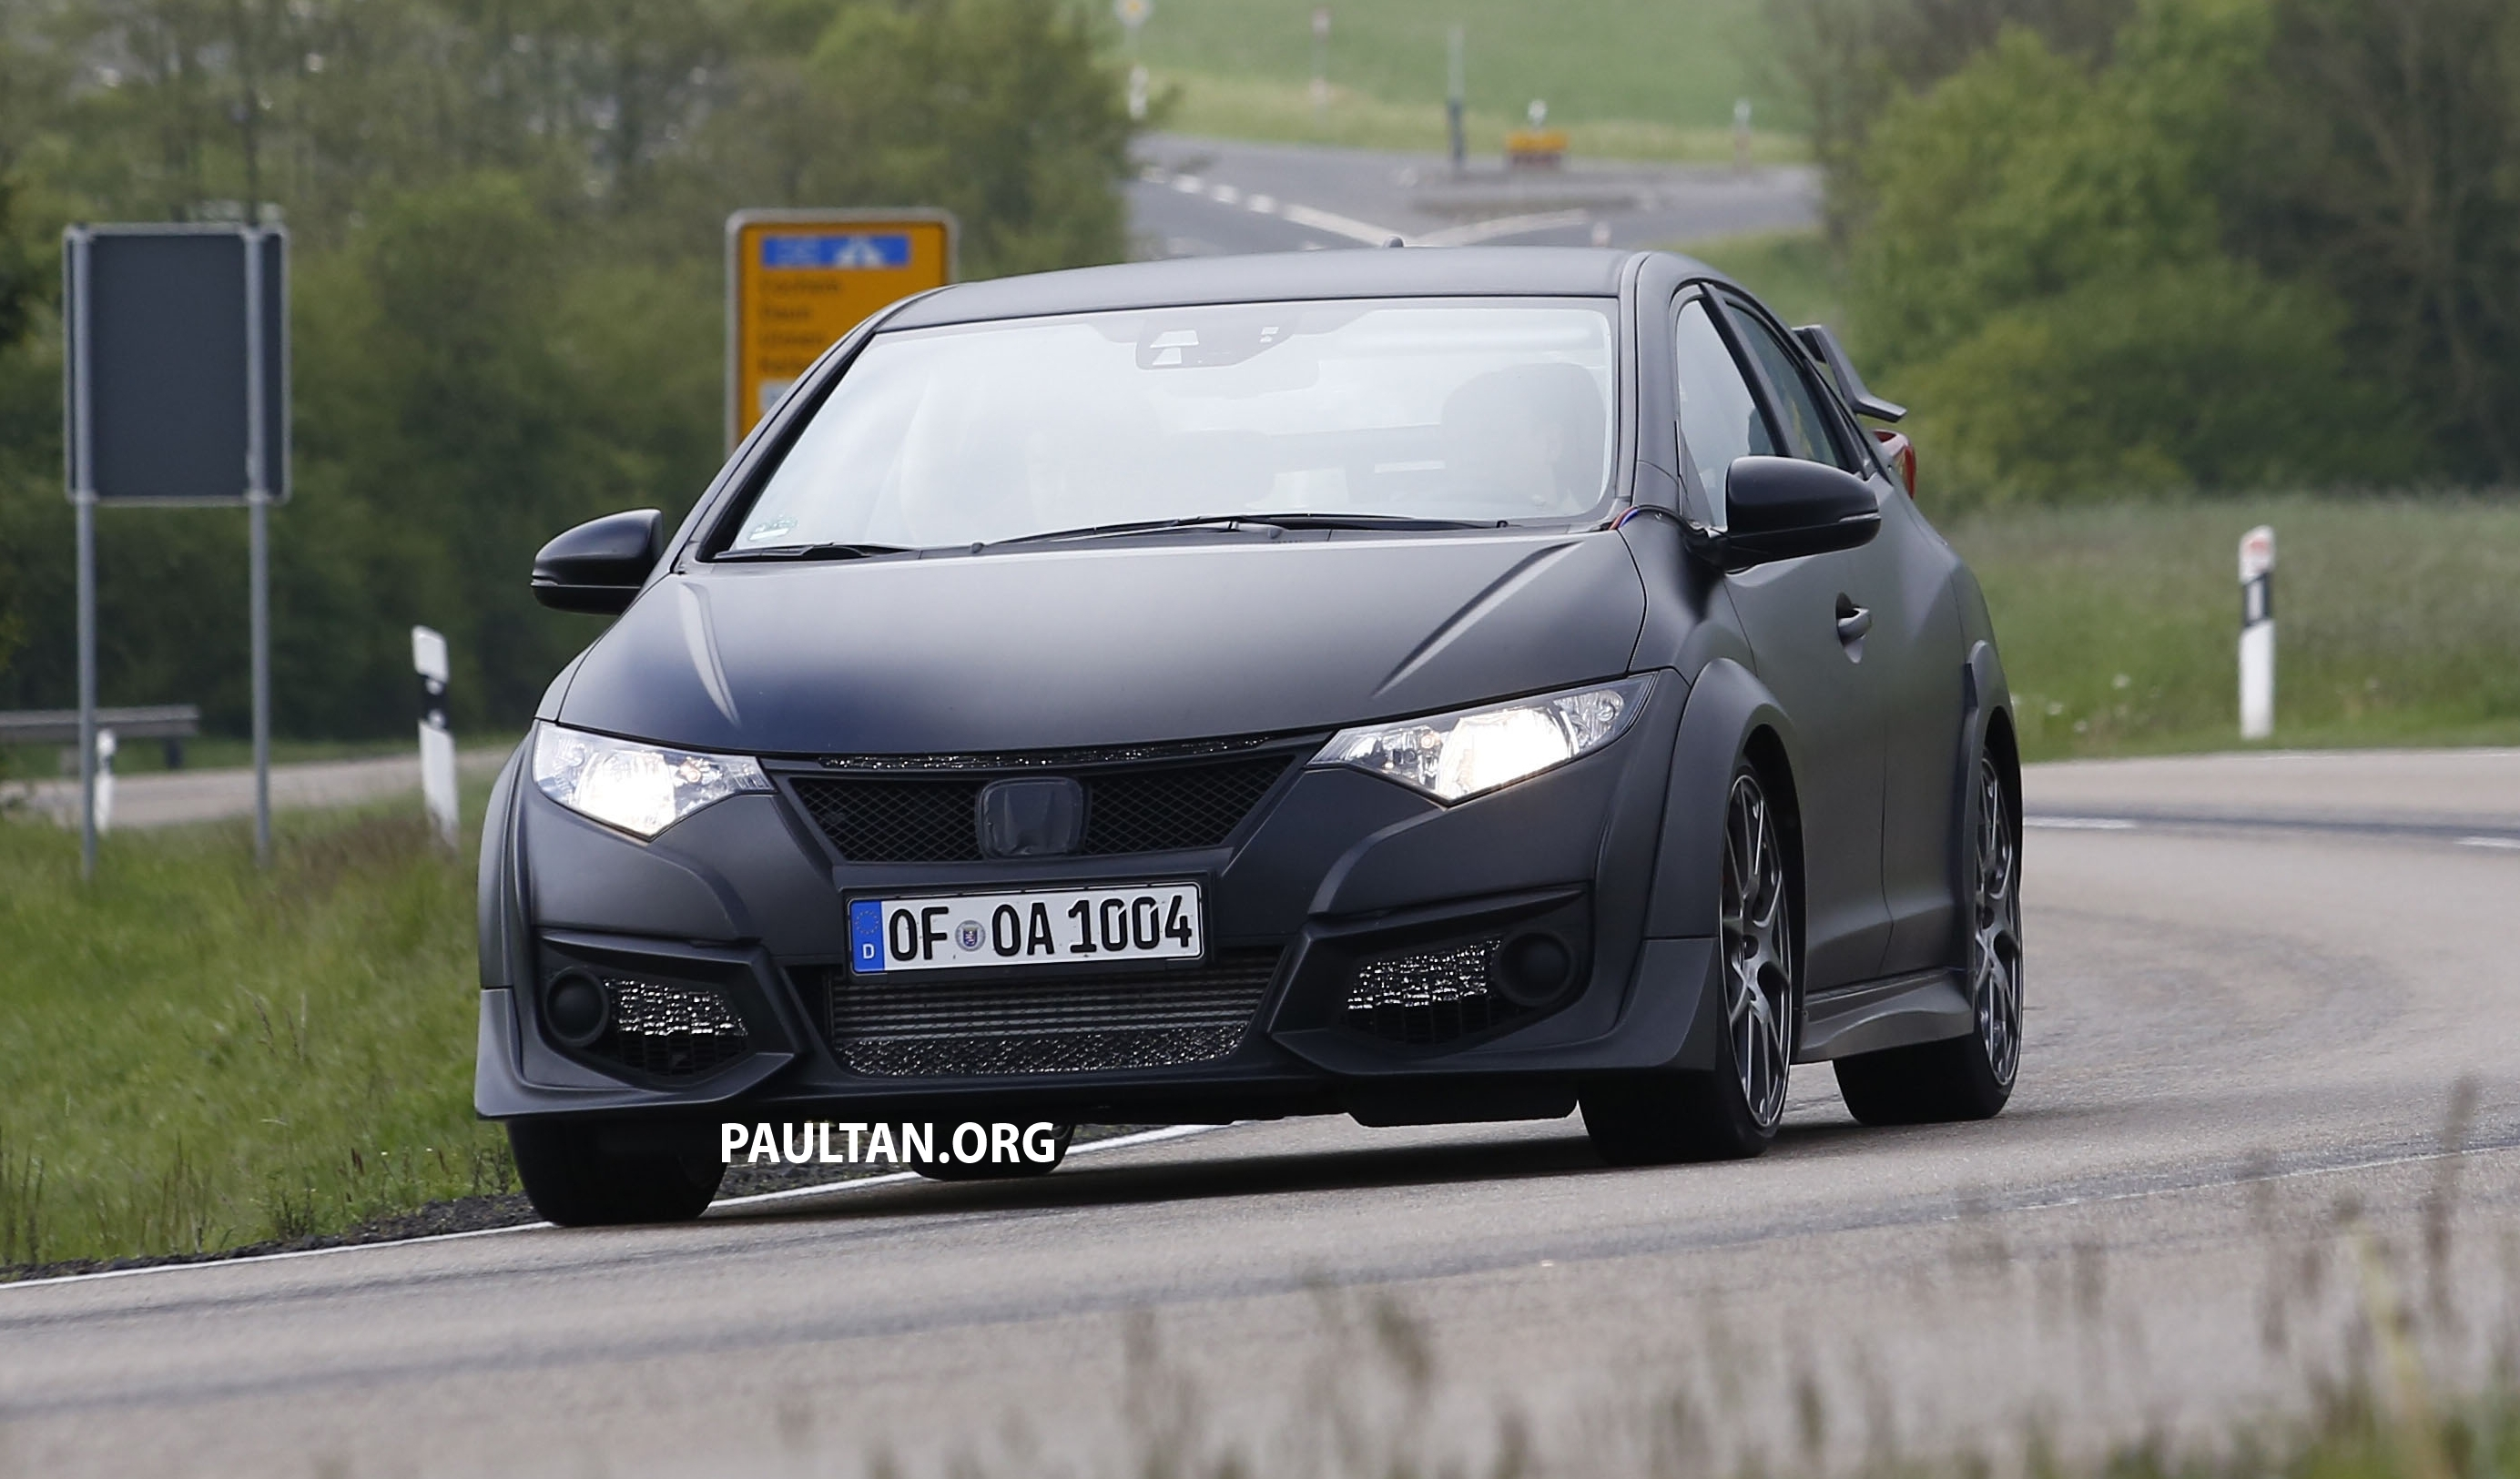 Spyshots 2015 Honda Civic Type R Drops The Camo Paul Tan